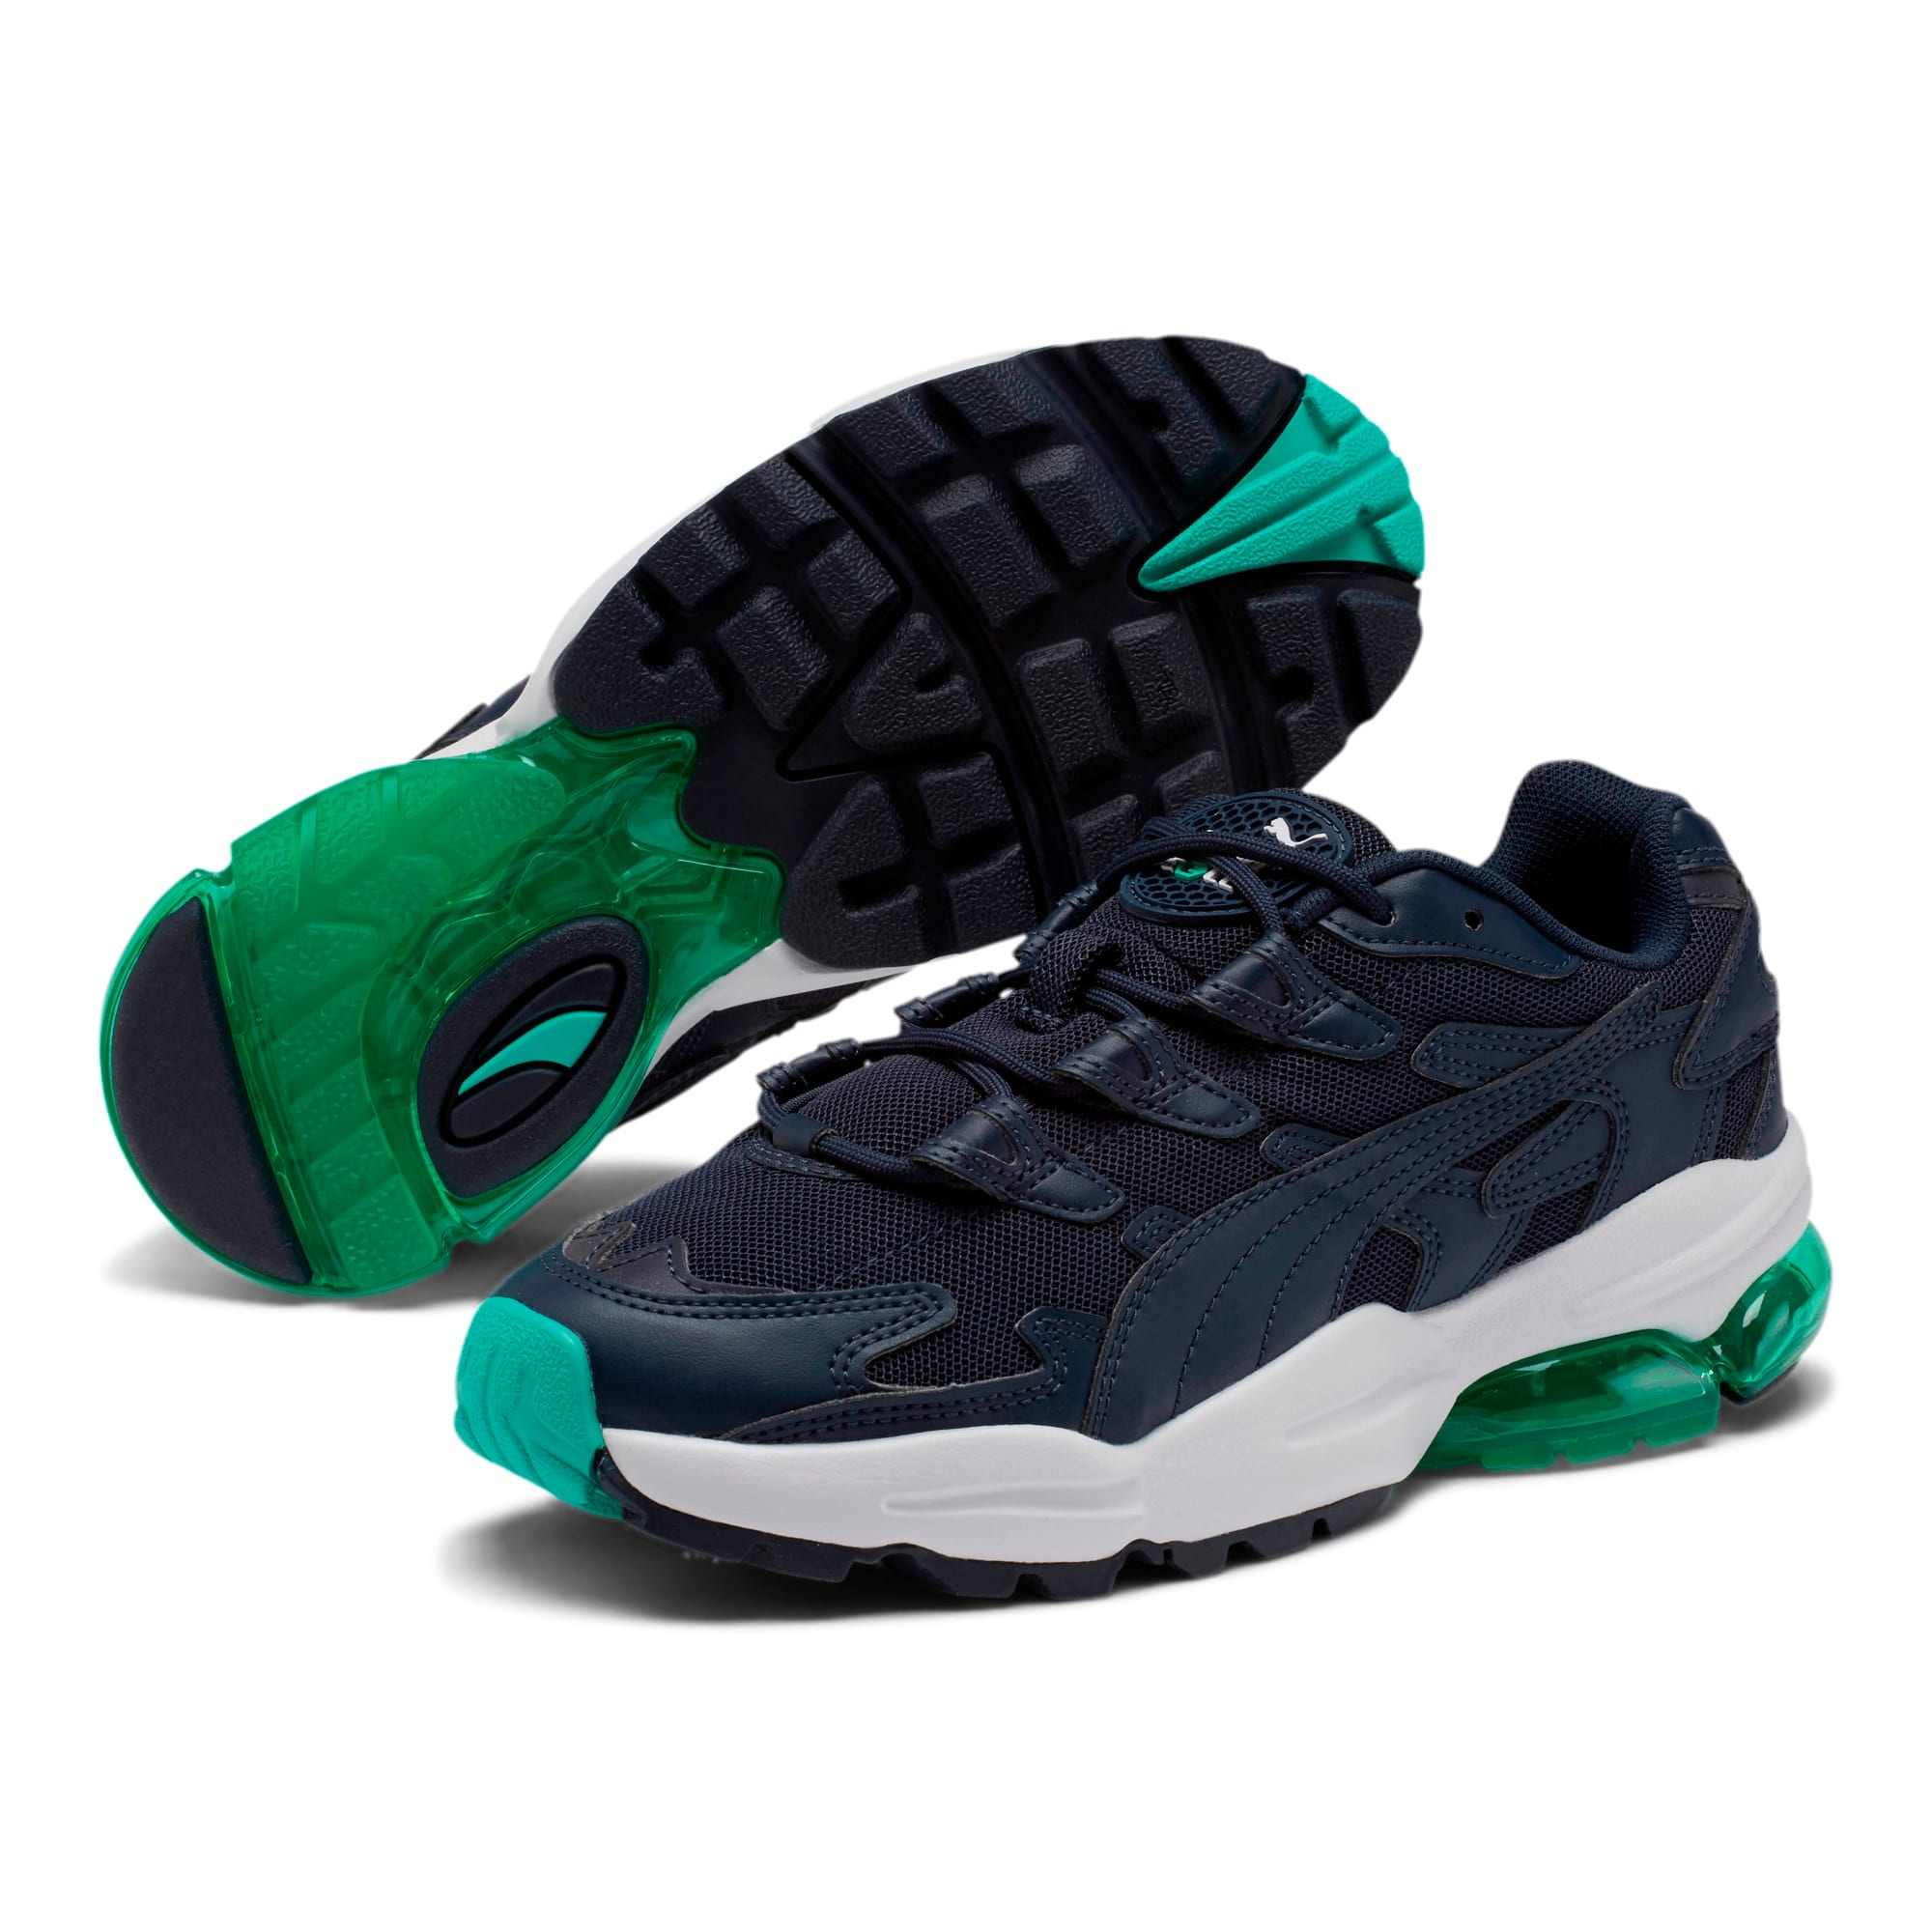 Thumbnail 2 of CELL Alien 51 Sneakers JR, Peacoat-Biscay Green, medium